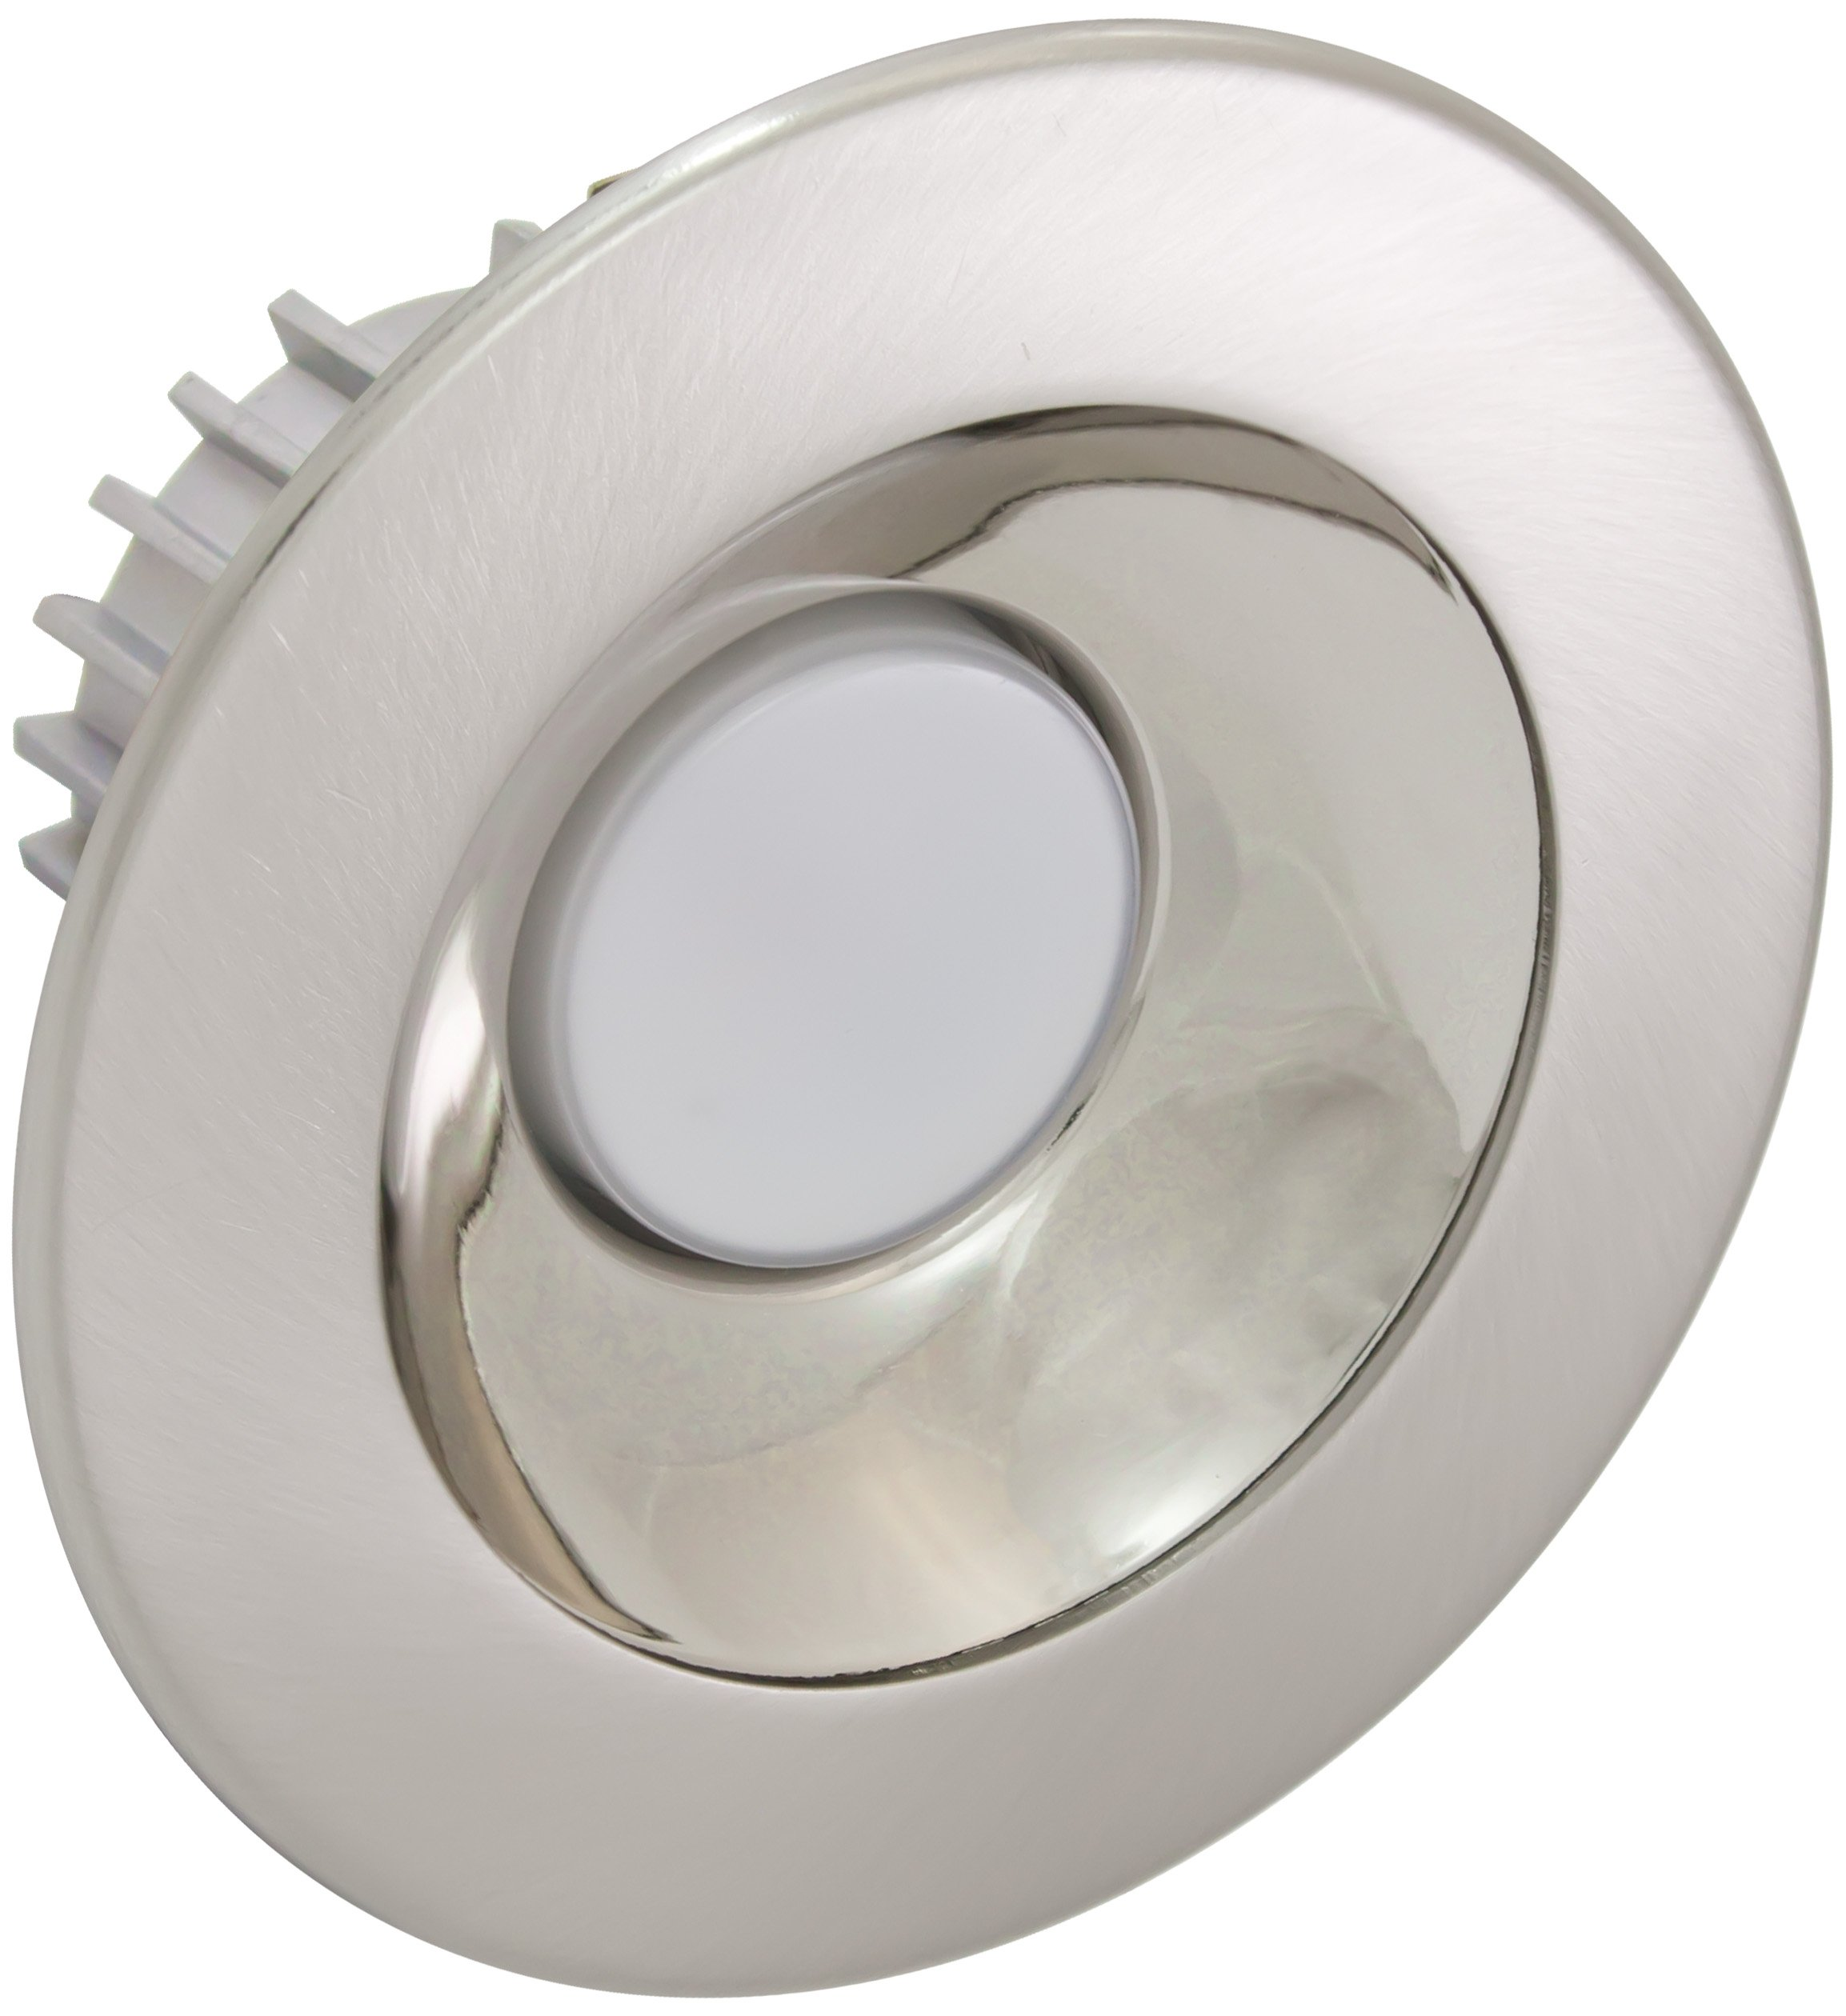 American Lighting X4-ALM-AL-X34 4-Inch Downlight X34 Series Trim Kit with Satin Aluminum Multiplier, Aluminum